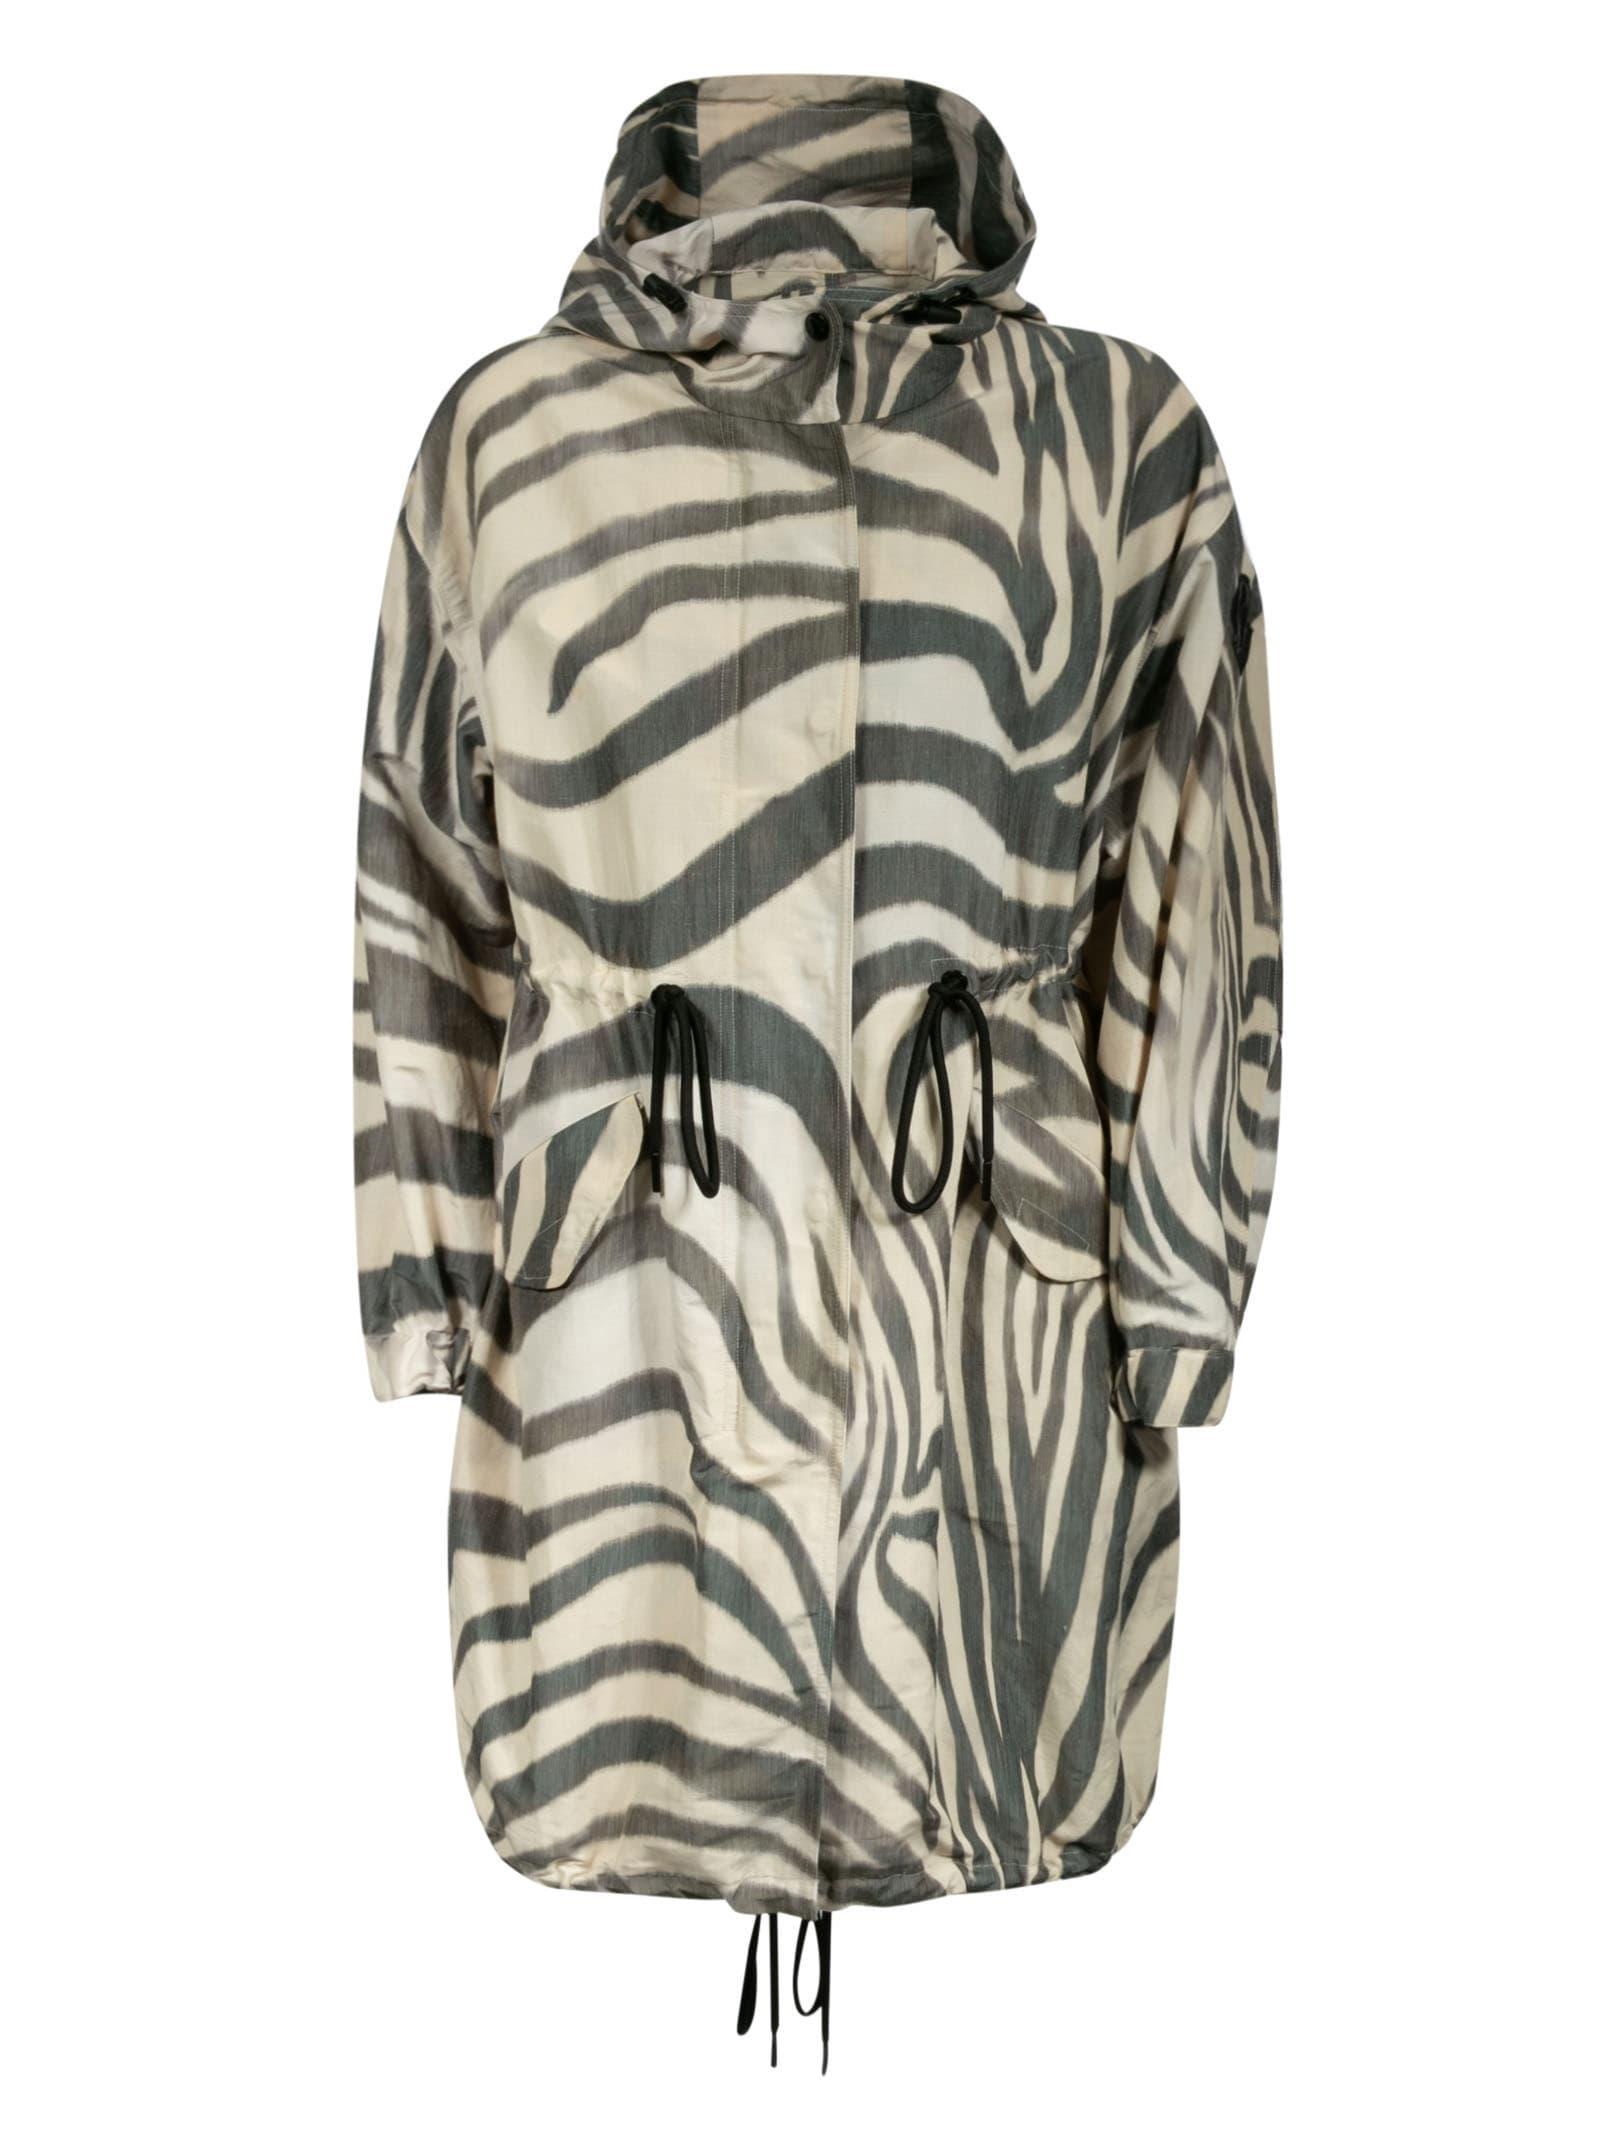 Moncler Archid Zebra Print Jacket